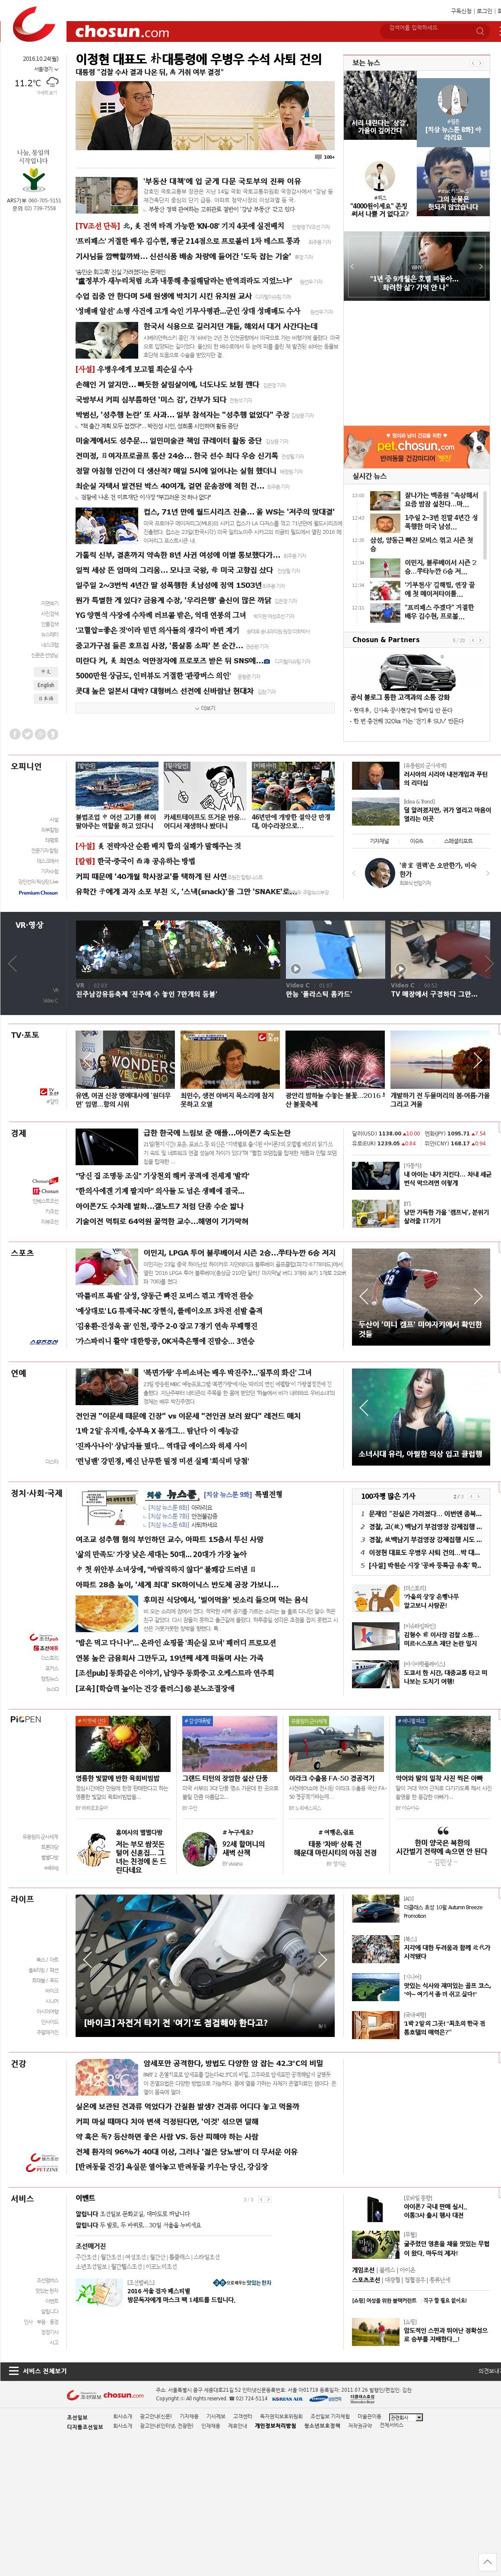 chosun.com at Sunday Oct. 23, 2016, 4:02 p.m. UTC